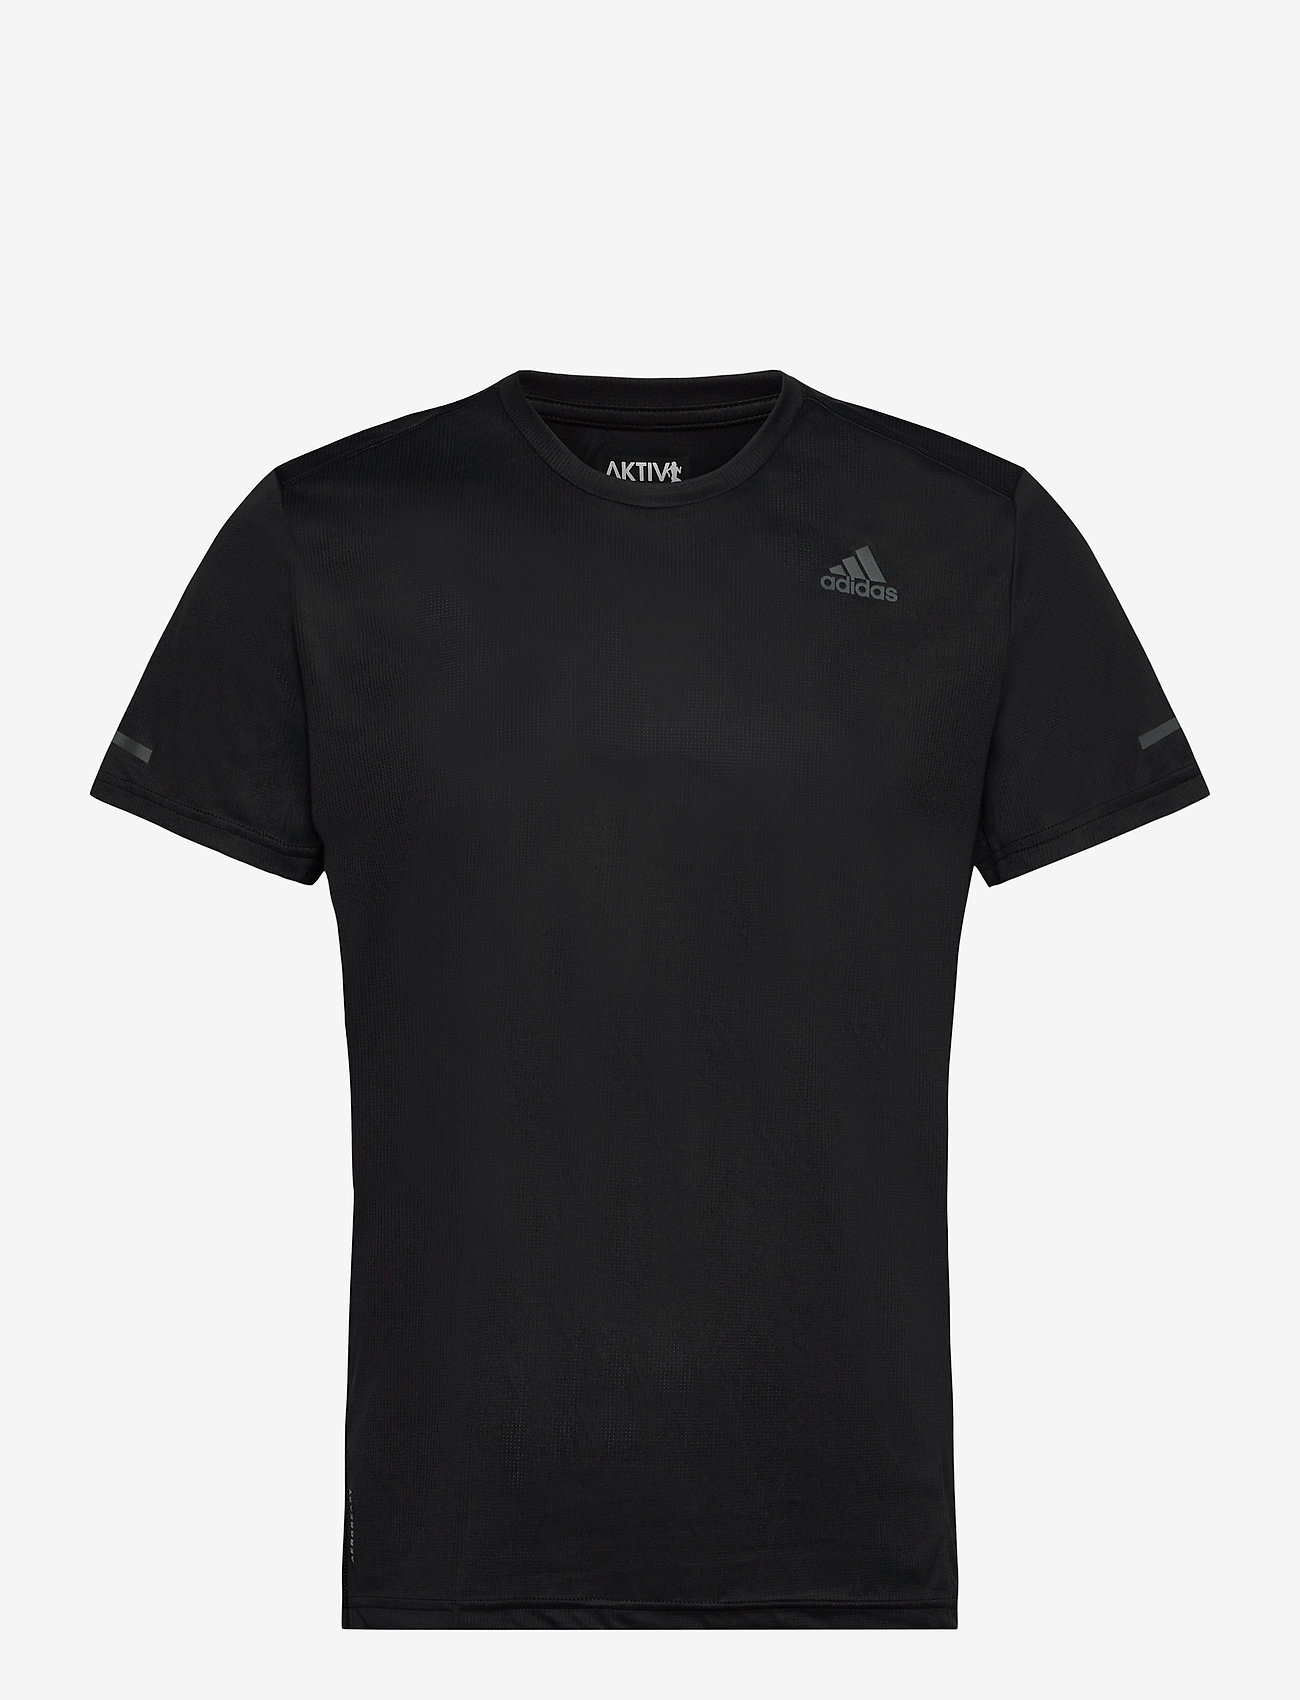 adidas Performance - Run It T-Shirt - sportoberteile - black - 1